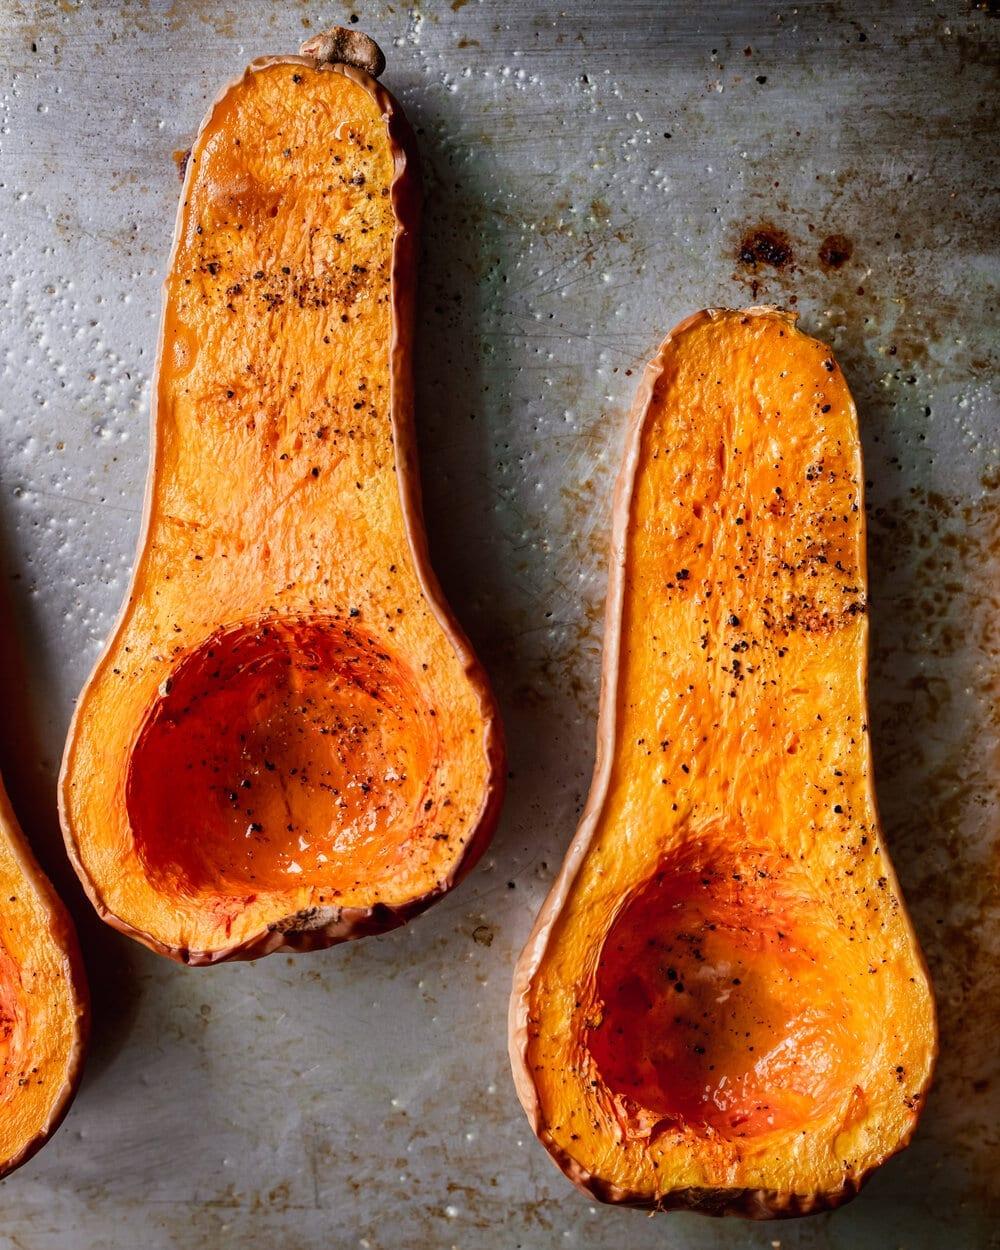 roasted butternut squash halves on baking tray